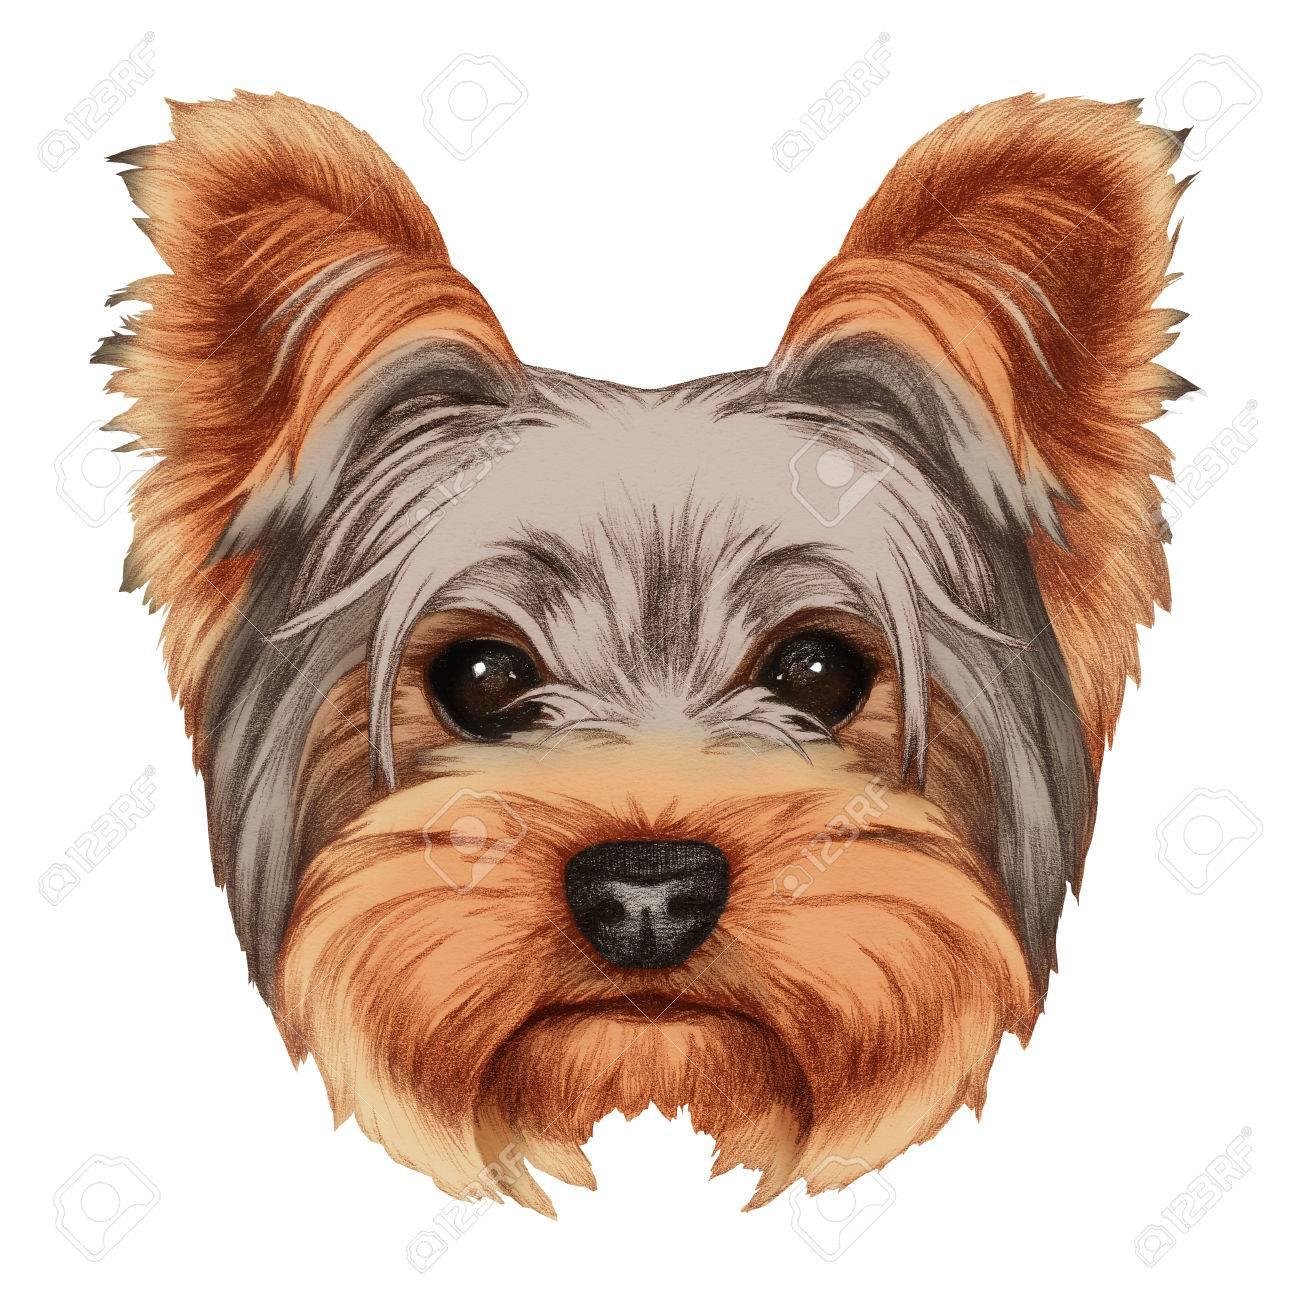 Portrait Of Yorkshire Terrier Dog Hand Drawn Illustration